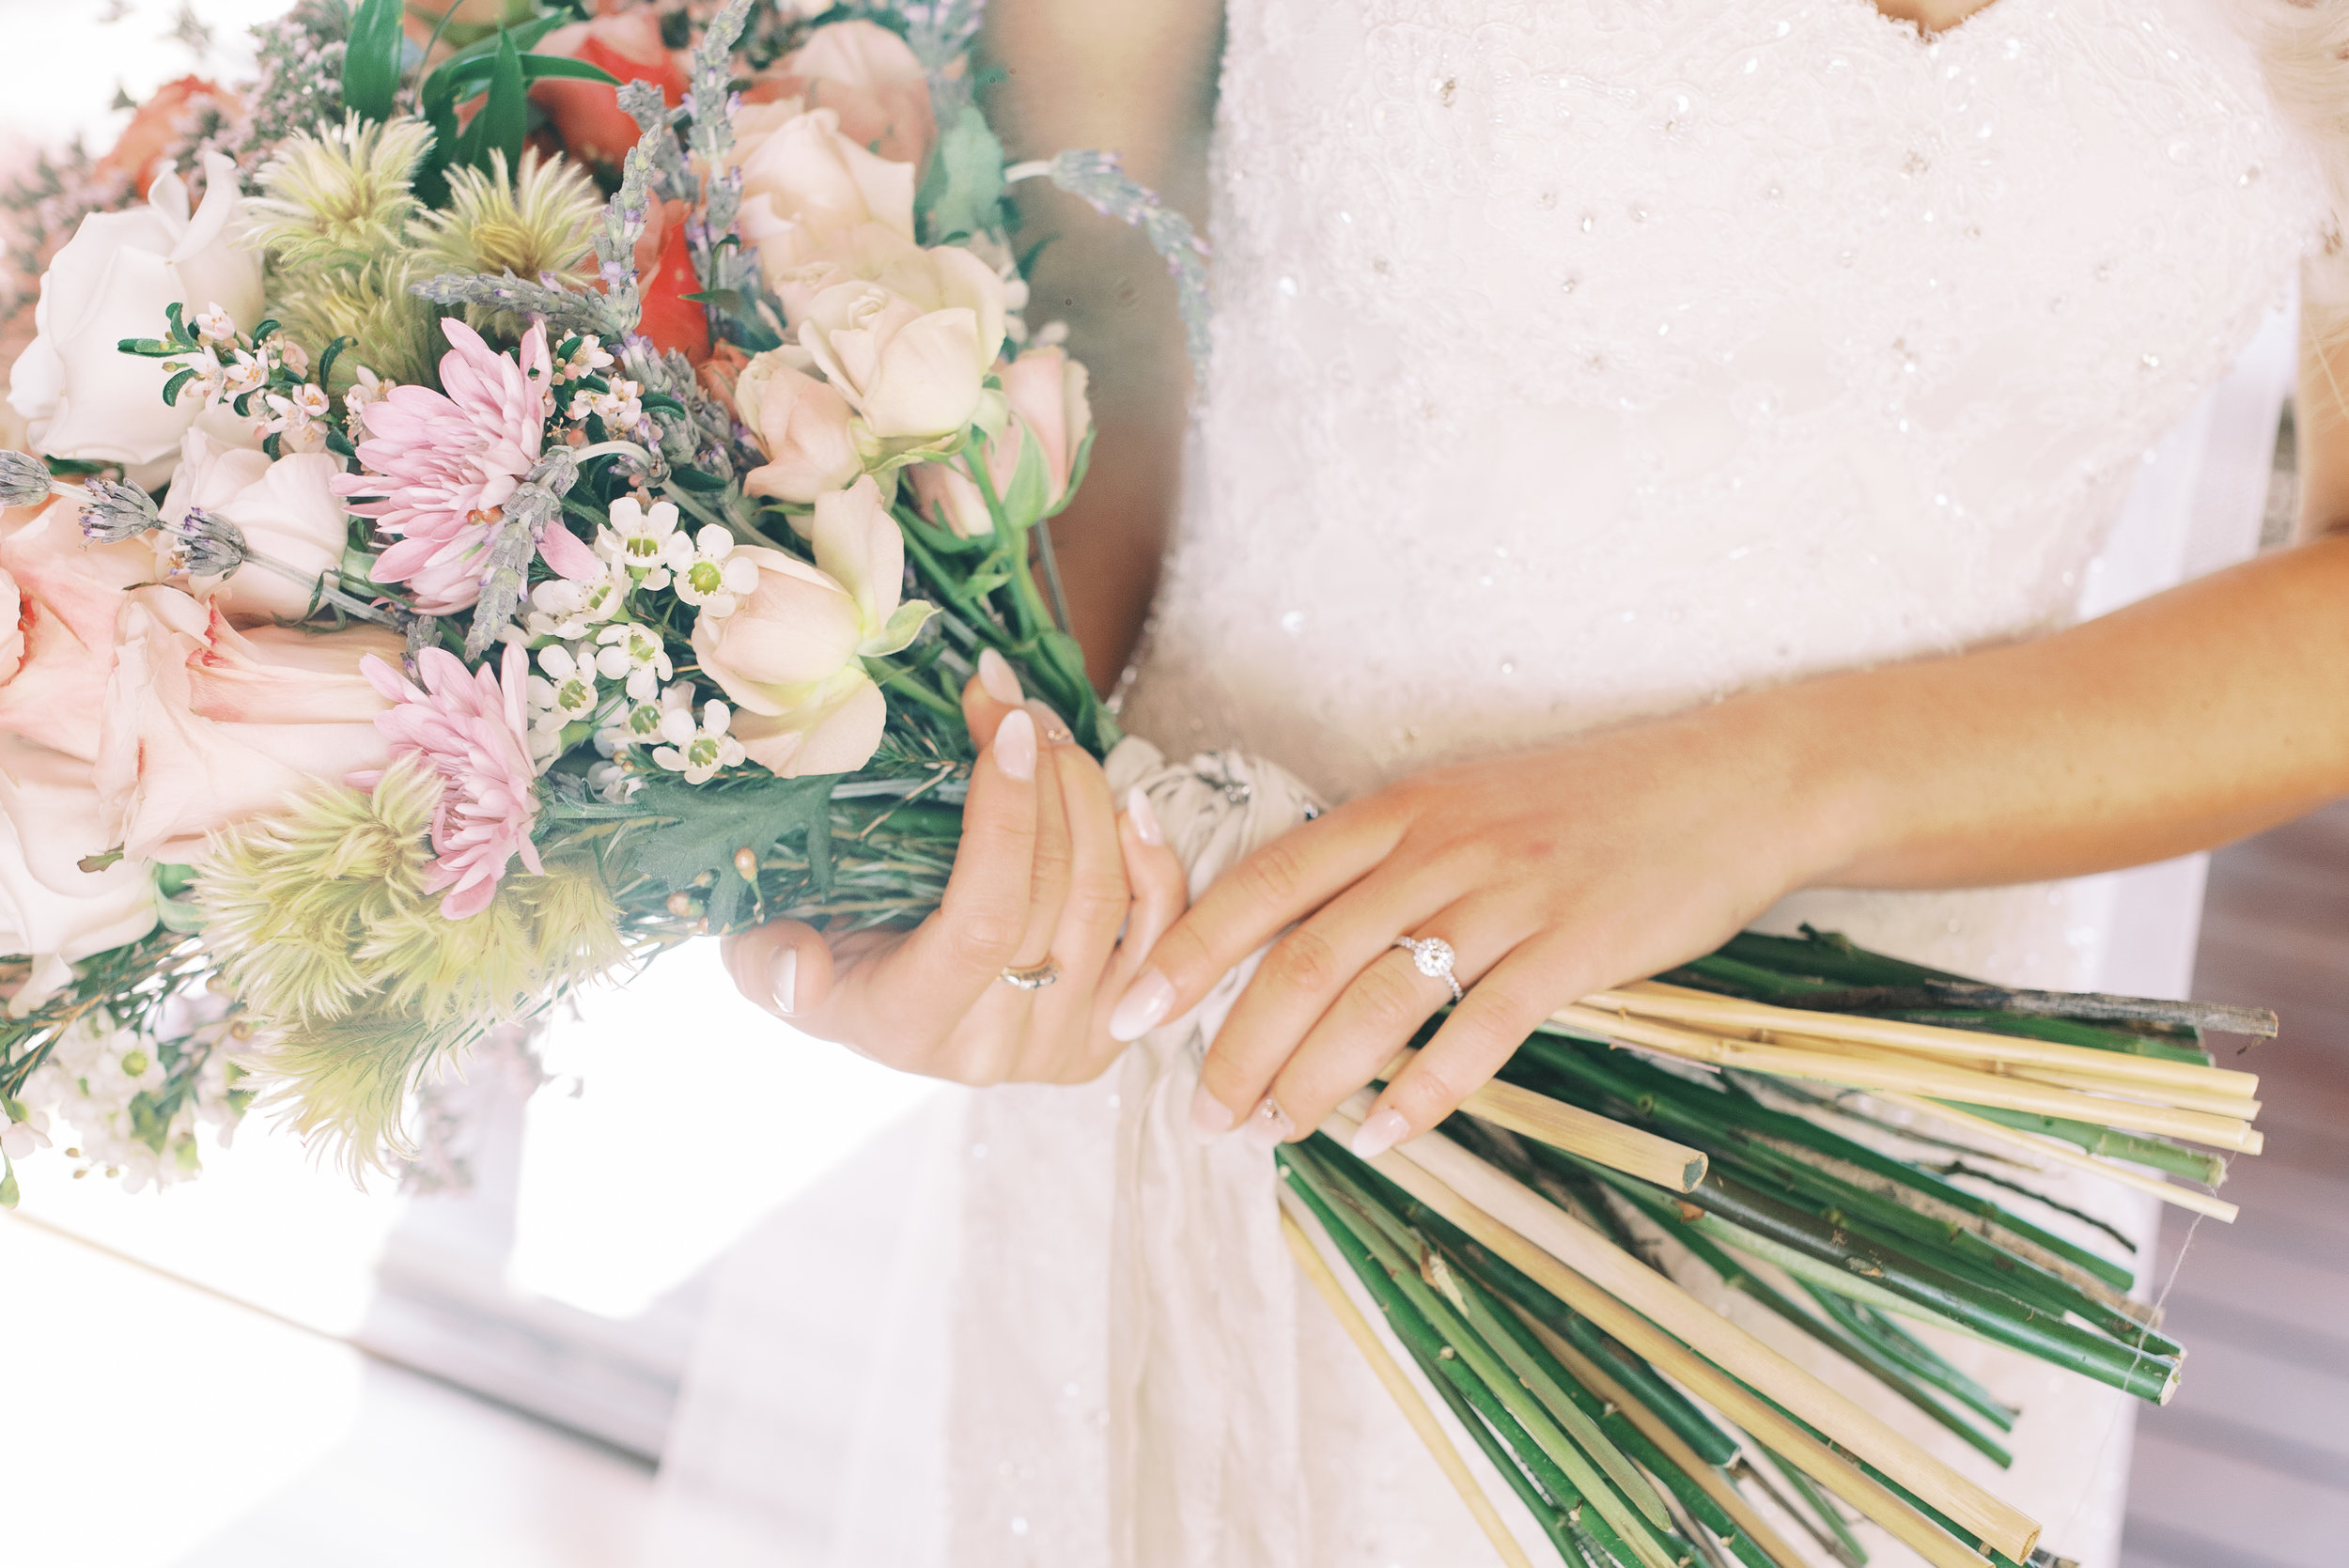 Kooroomba-Vineyard-Lavender-Farm-Wedding-Fine-Art-Lauren-Olivia-13.jpg